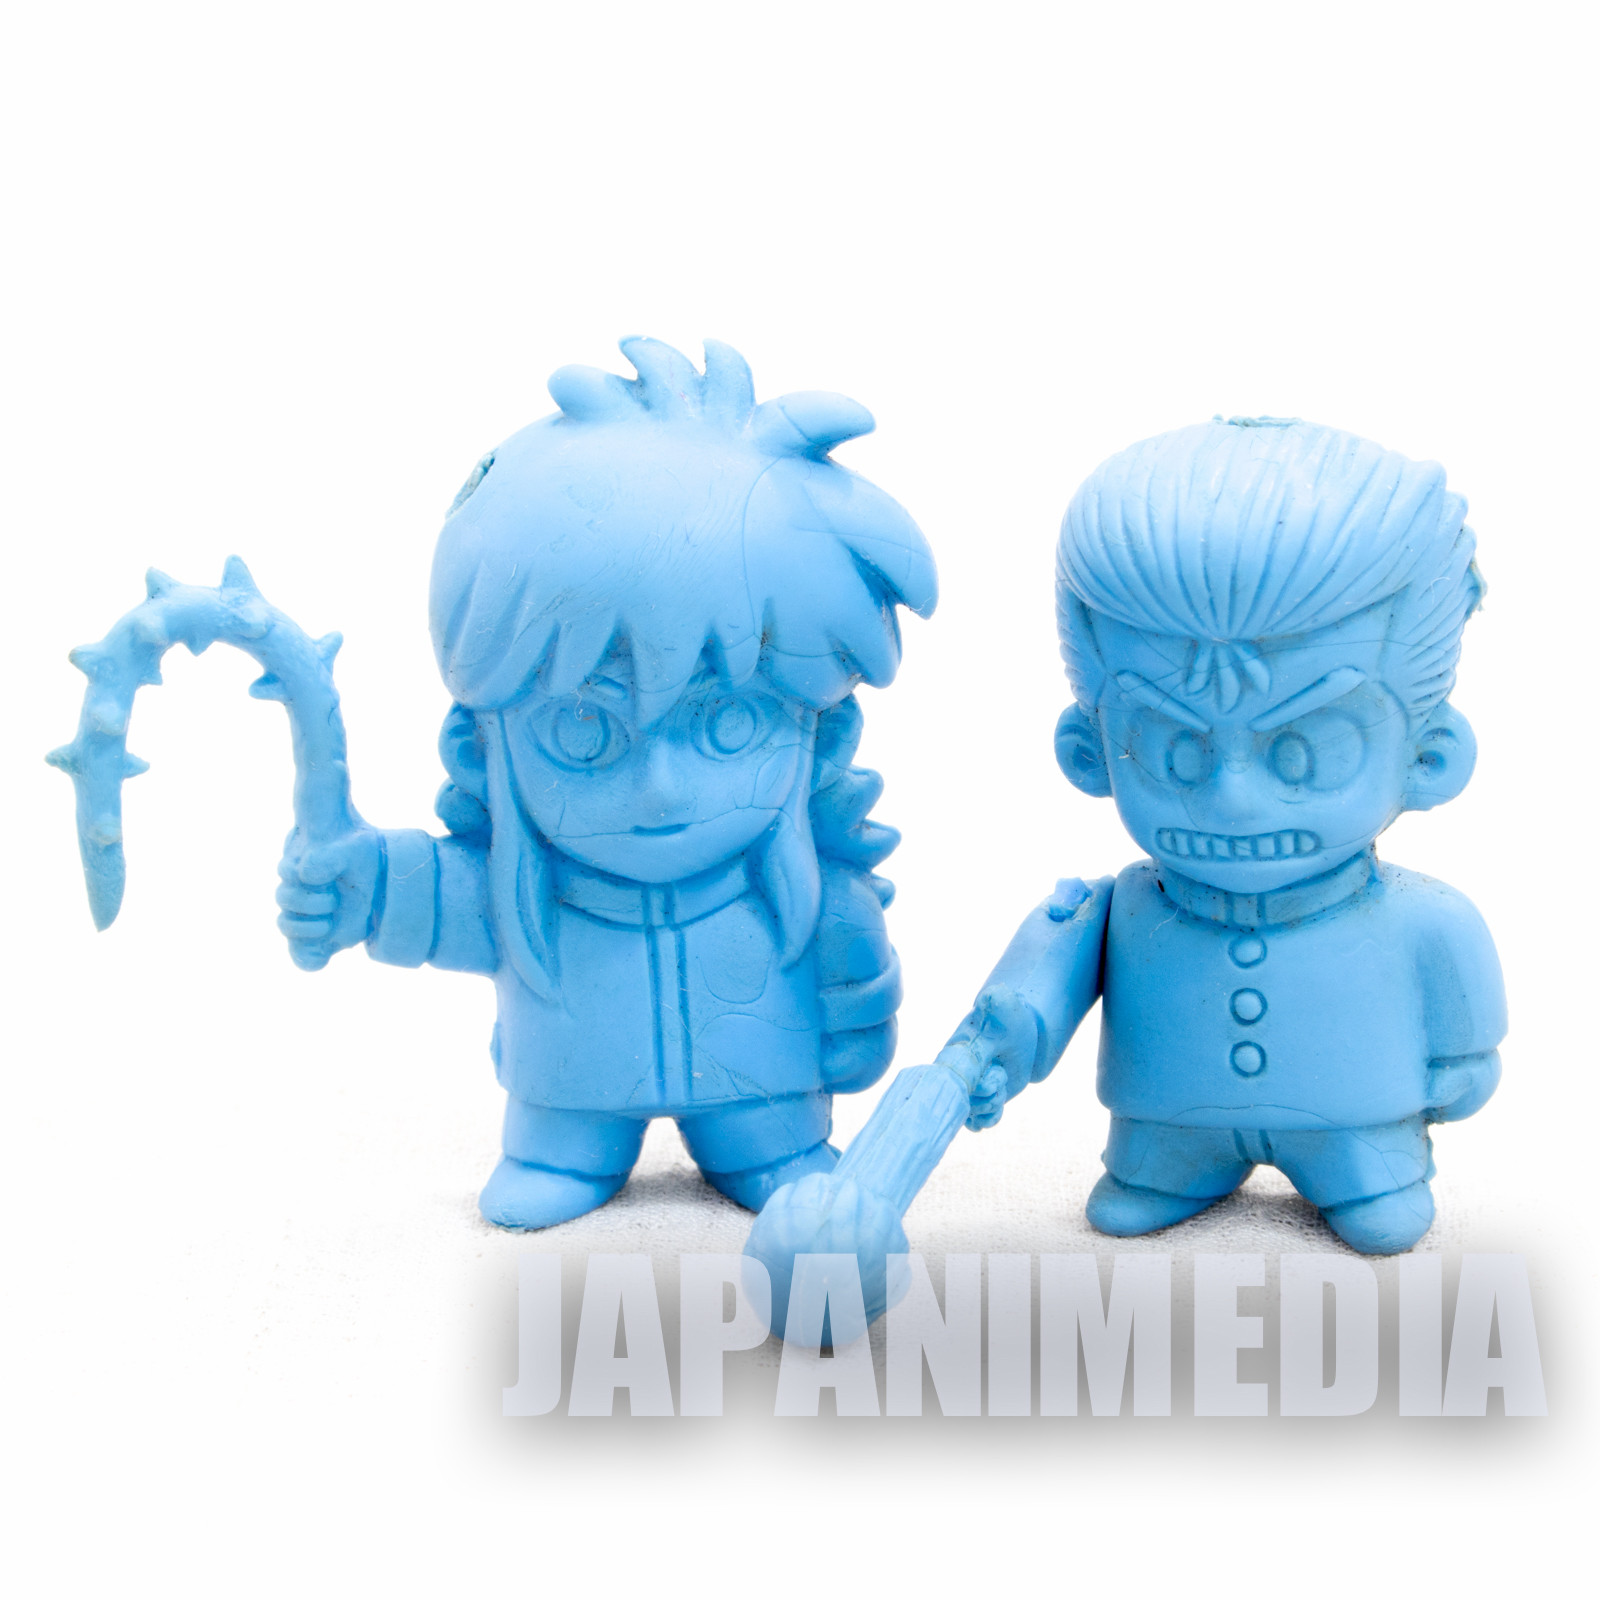 Retro Yu-Yu Hakusho Yusuke & Kurama Mini Rubber Figure 2pc Set JAPAN ANIME MANGA